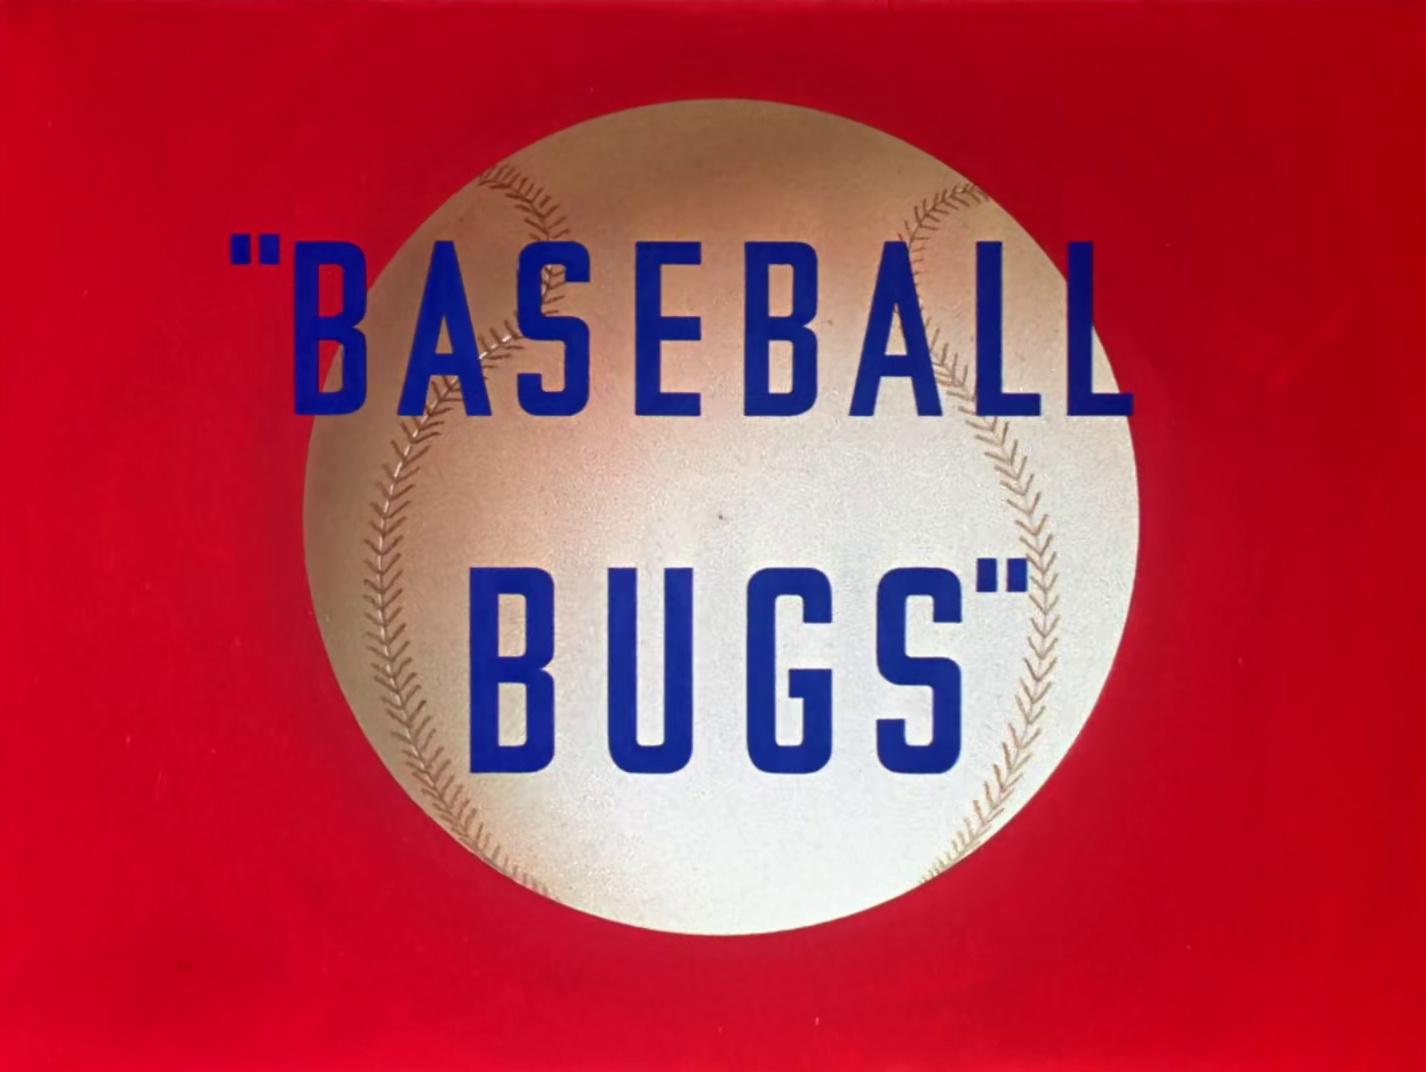 Baseball Bugs Looney Tunes Wiki Fandom Powered By Wikia